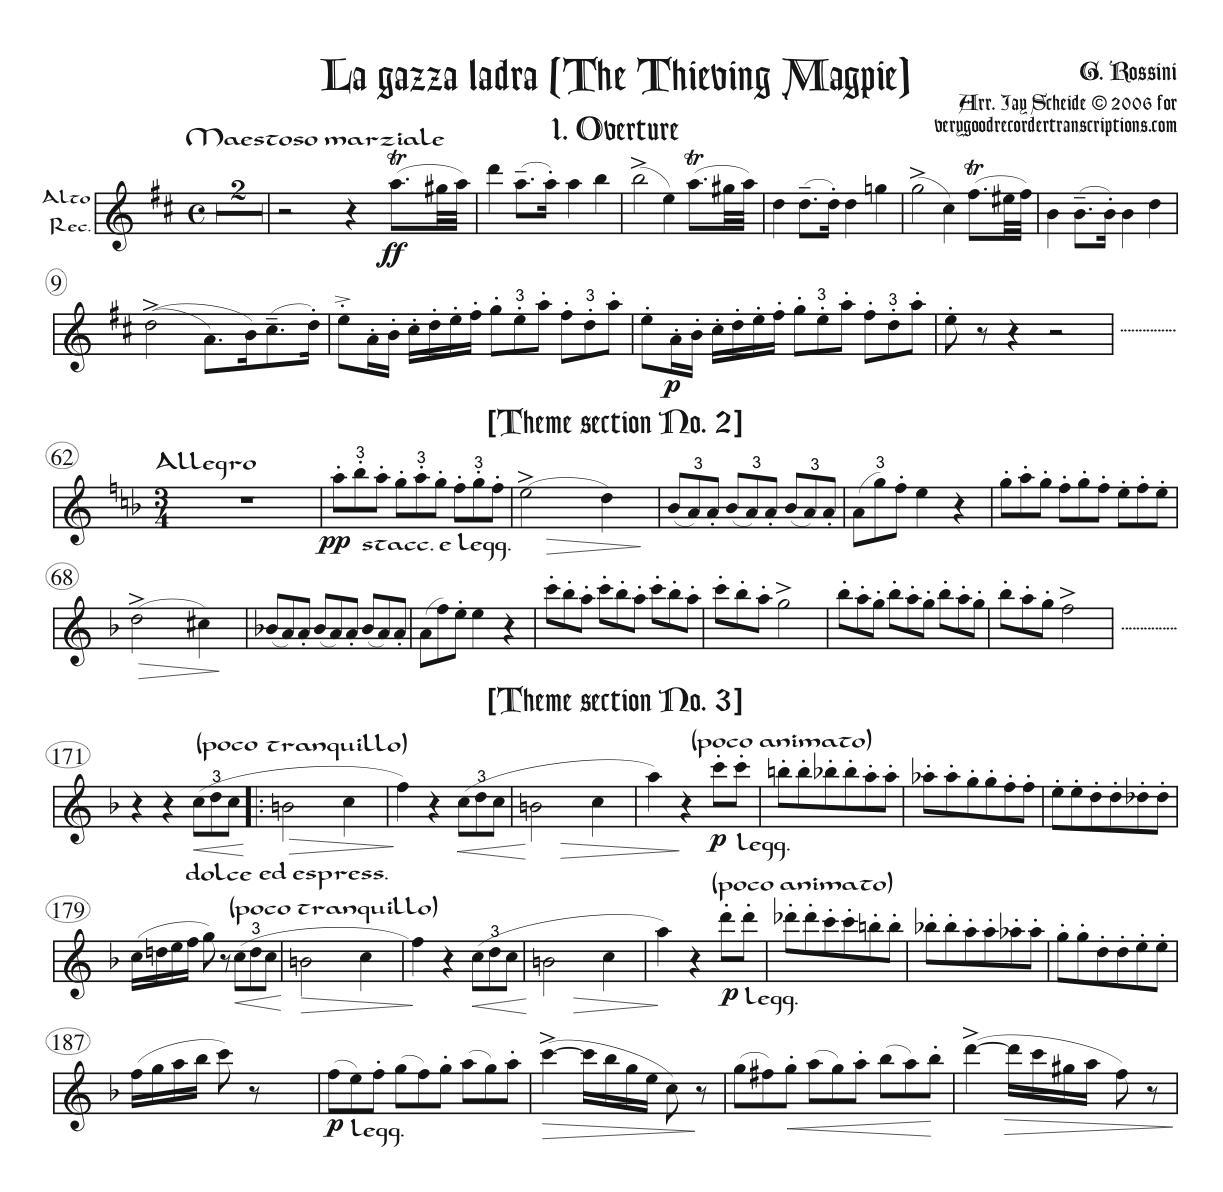 Overture to *La gazza ladra* (The Thieving Magpie)